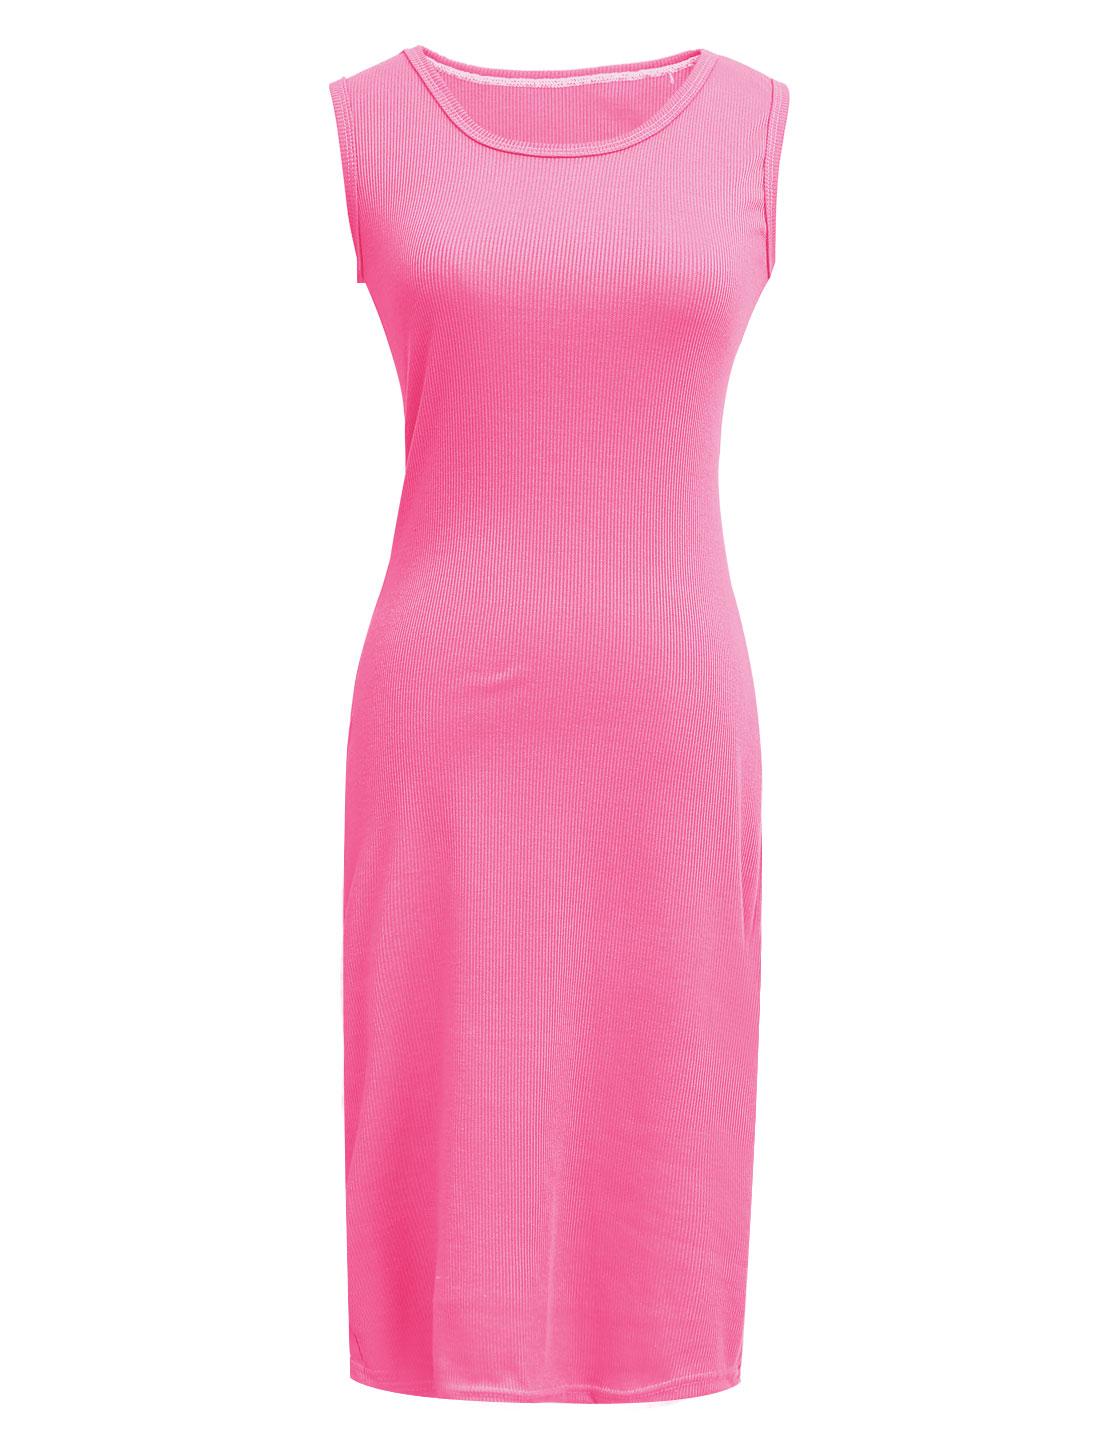 Women NEW Style Sleeveless Elastic Knitted Dress Hot Pink XS